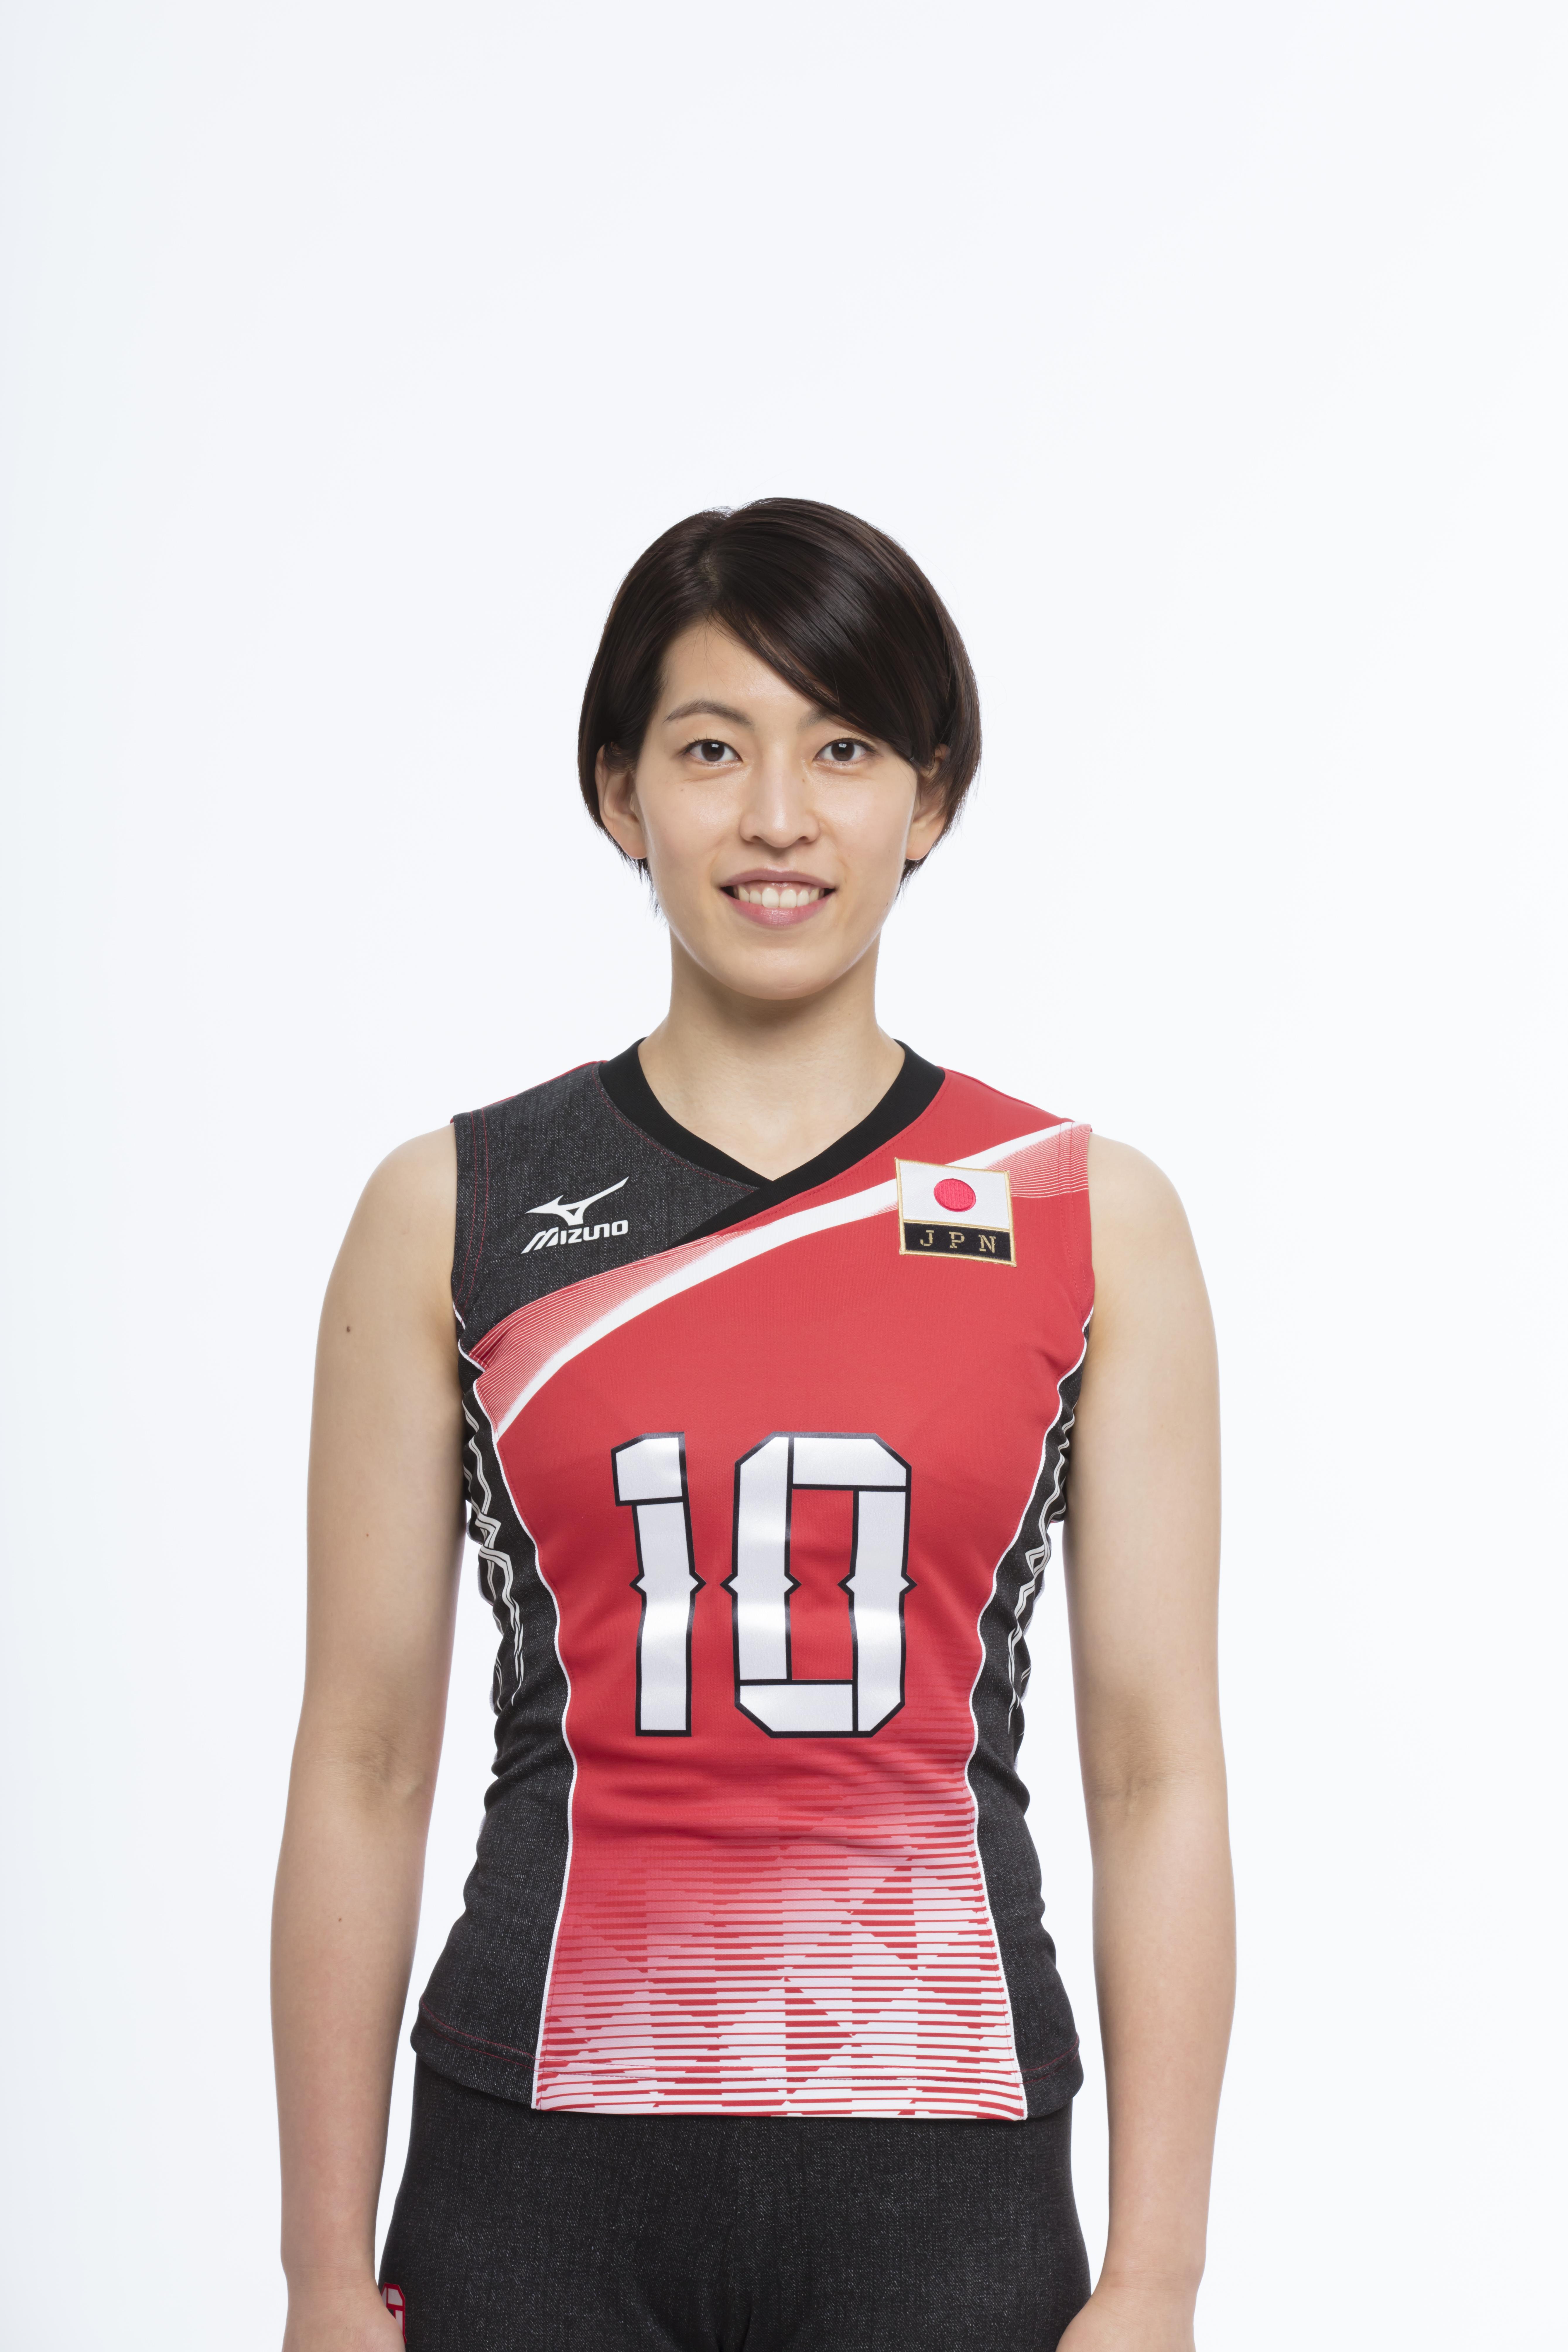 Koyomi Tominaga